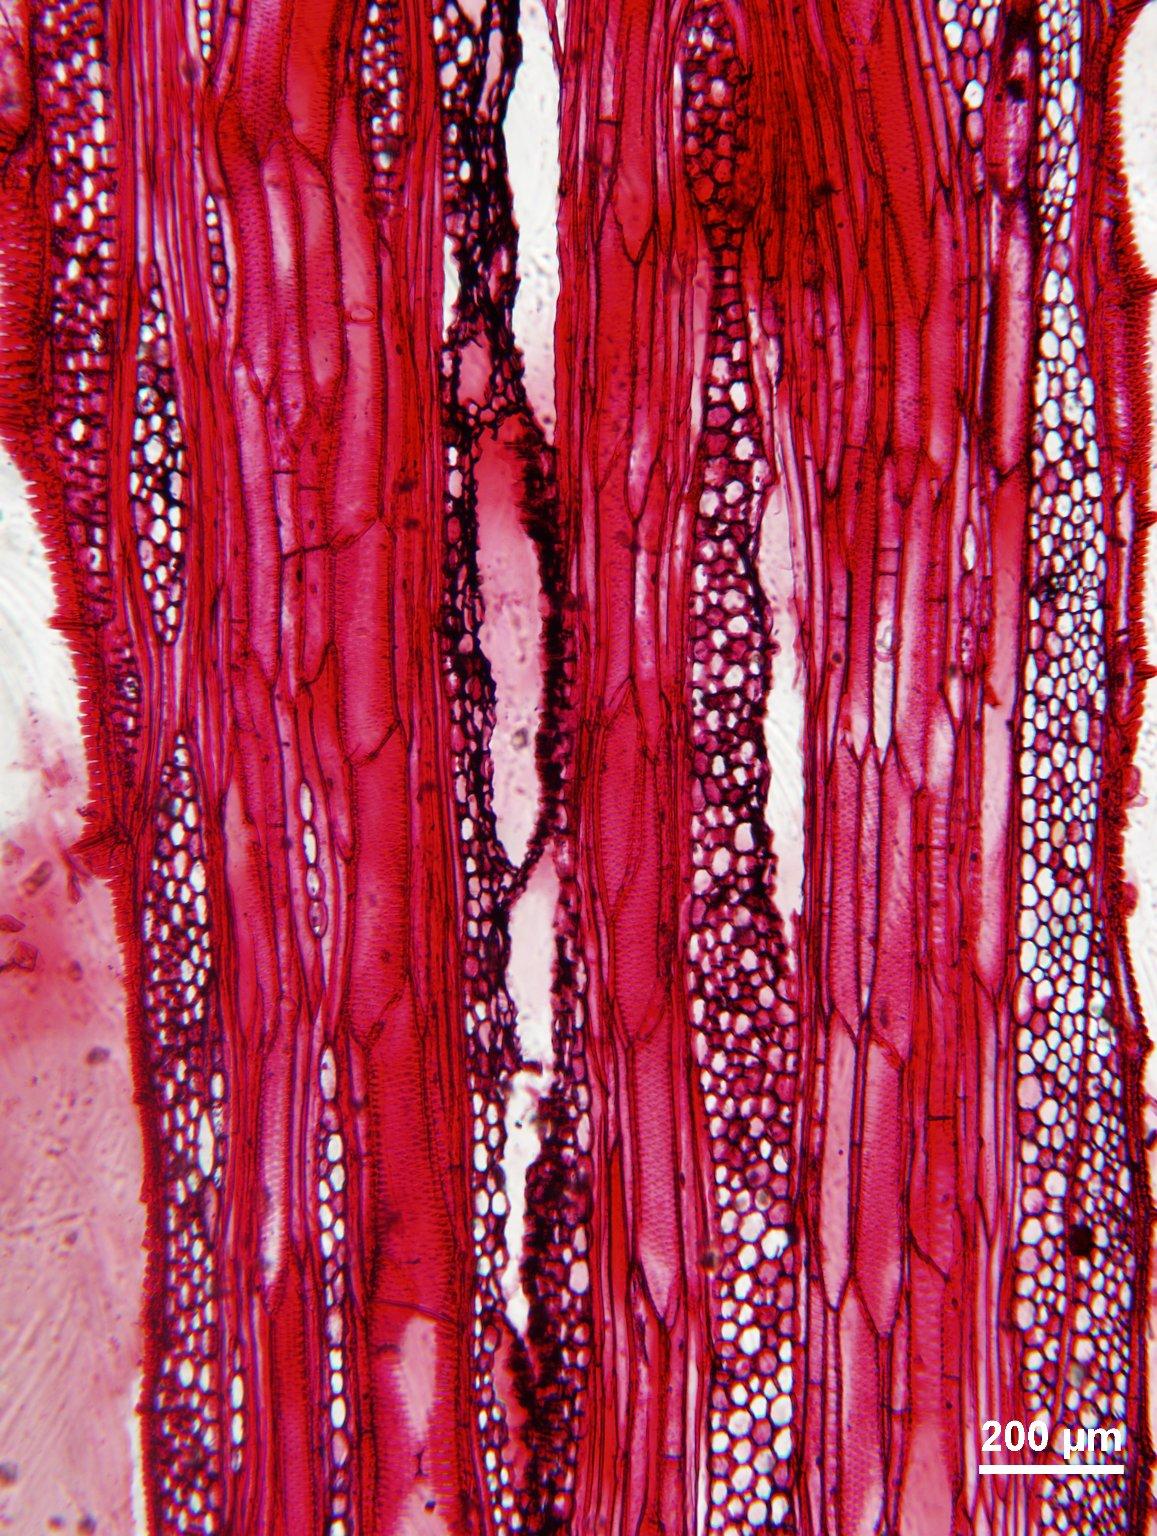 HERNANDIACEAE Illigera luzonensis